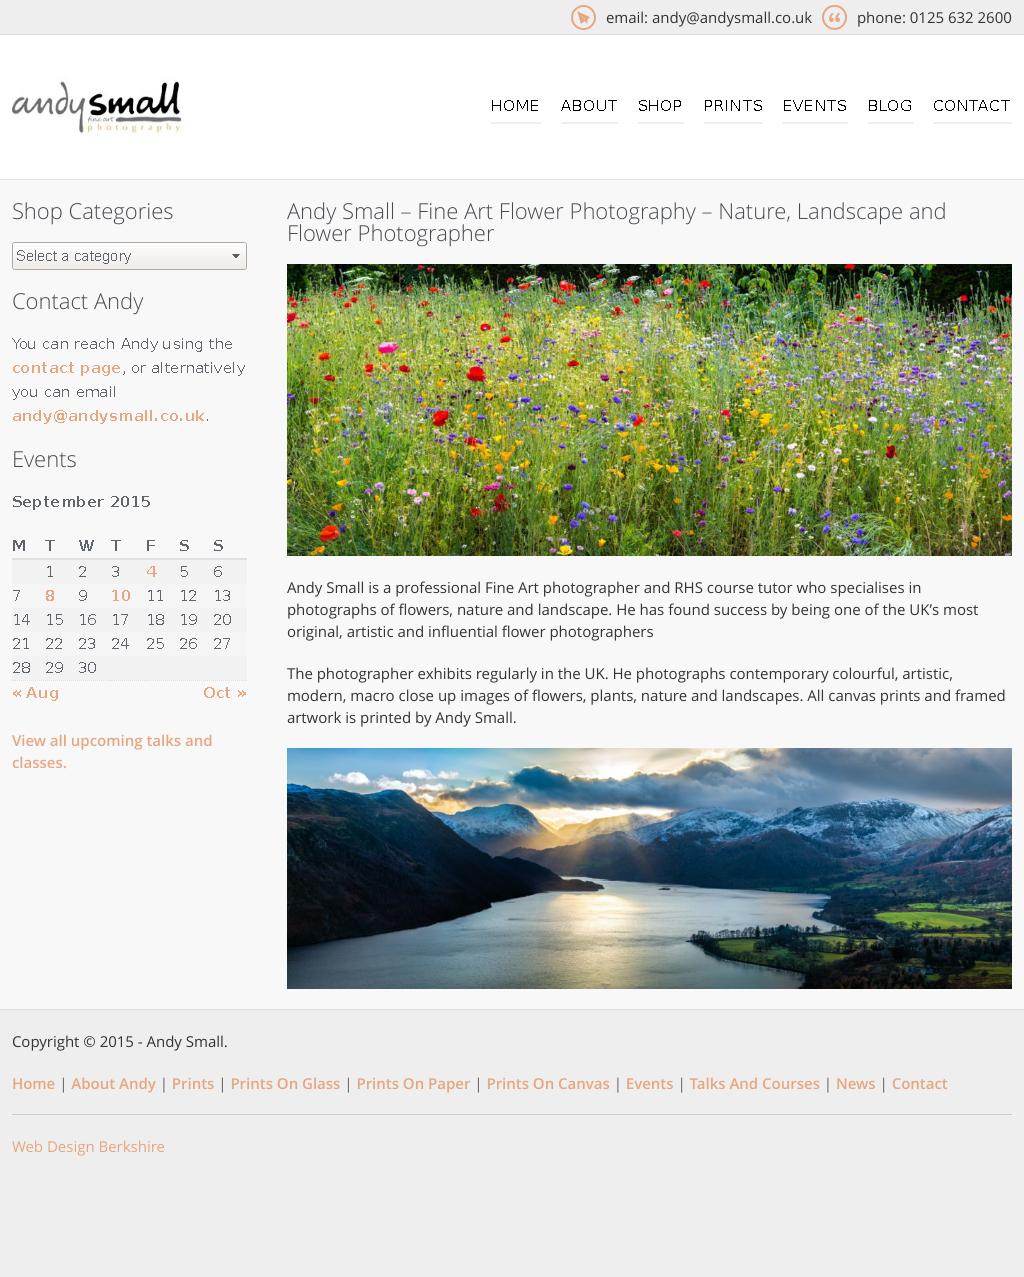 andy-small-web-design-berkshire-portfolio